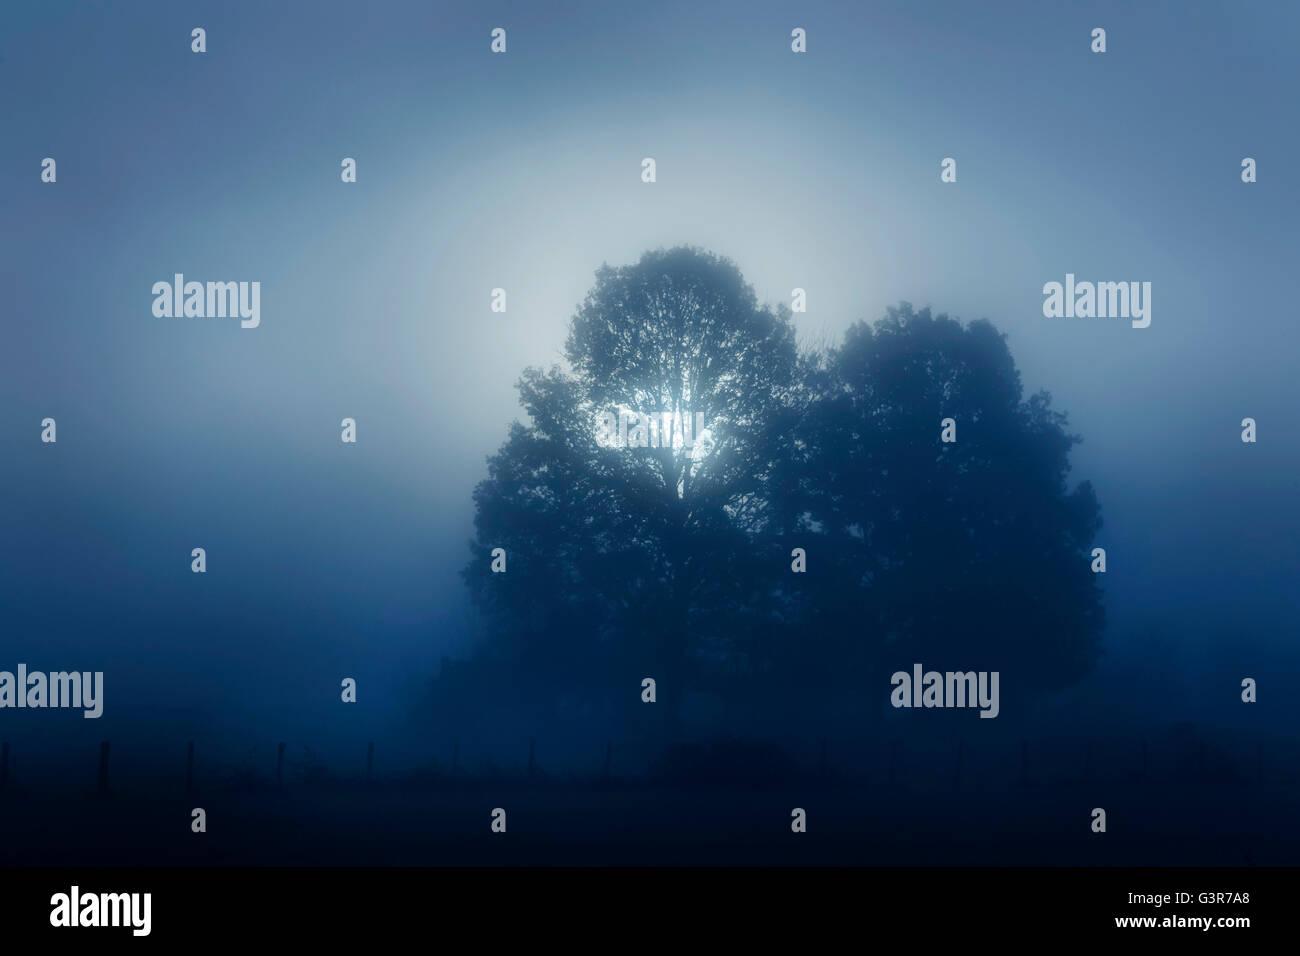 Sunrise shining through a tree at foggy morning, Lac du Der, Haute Marne, Franc. - Stock Image